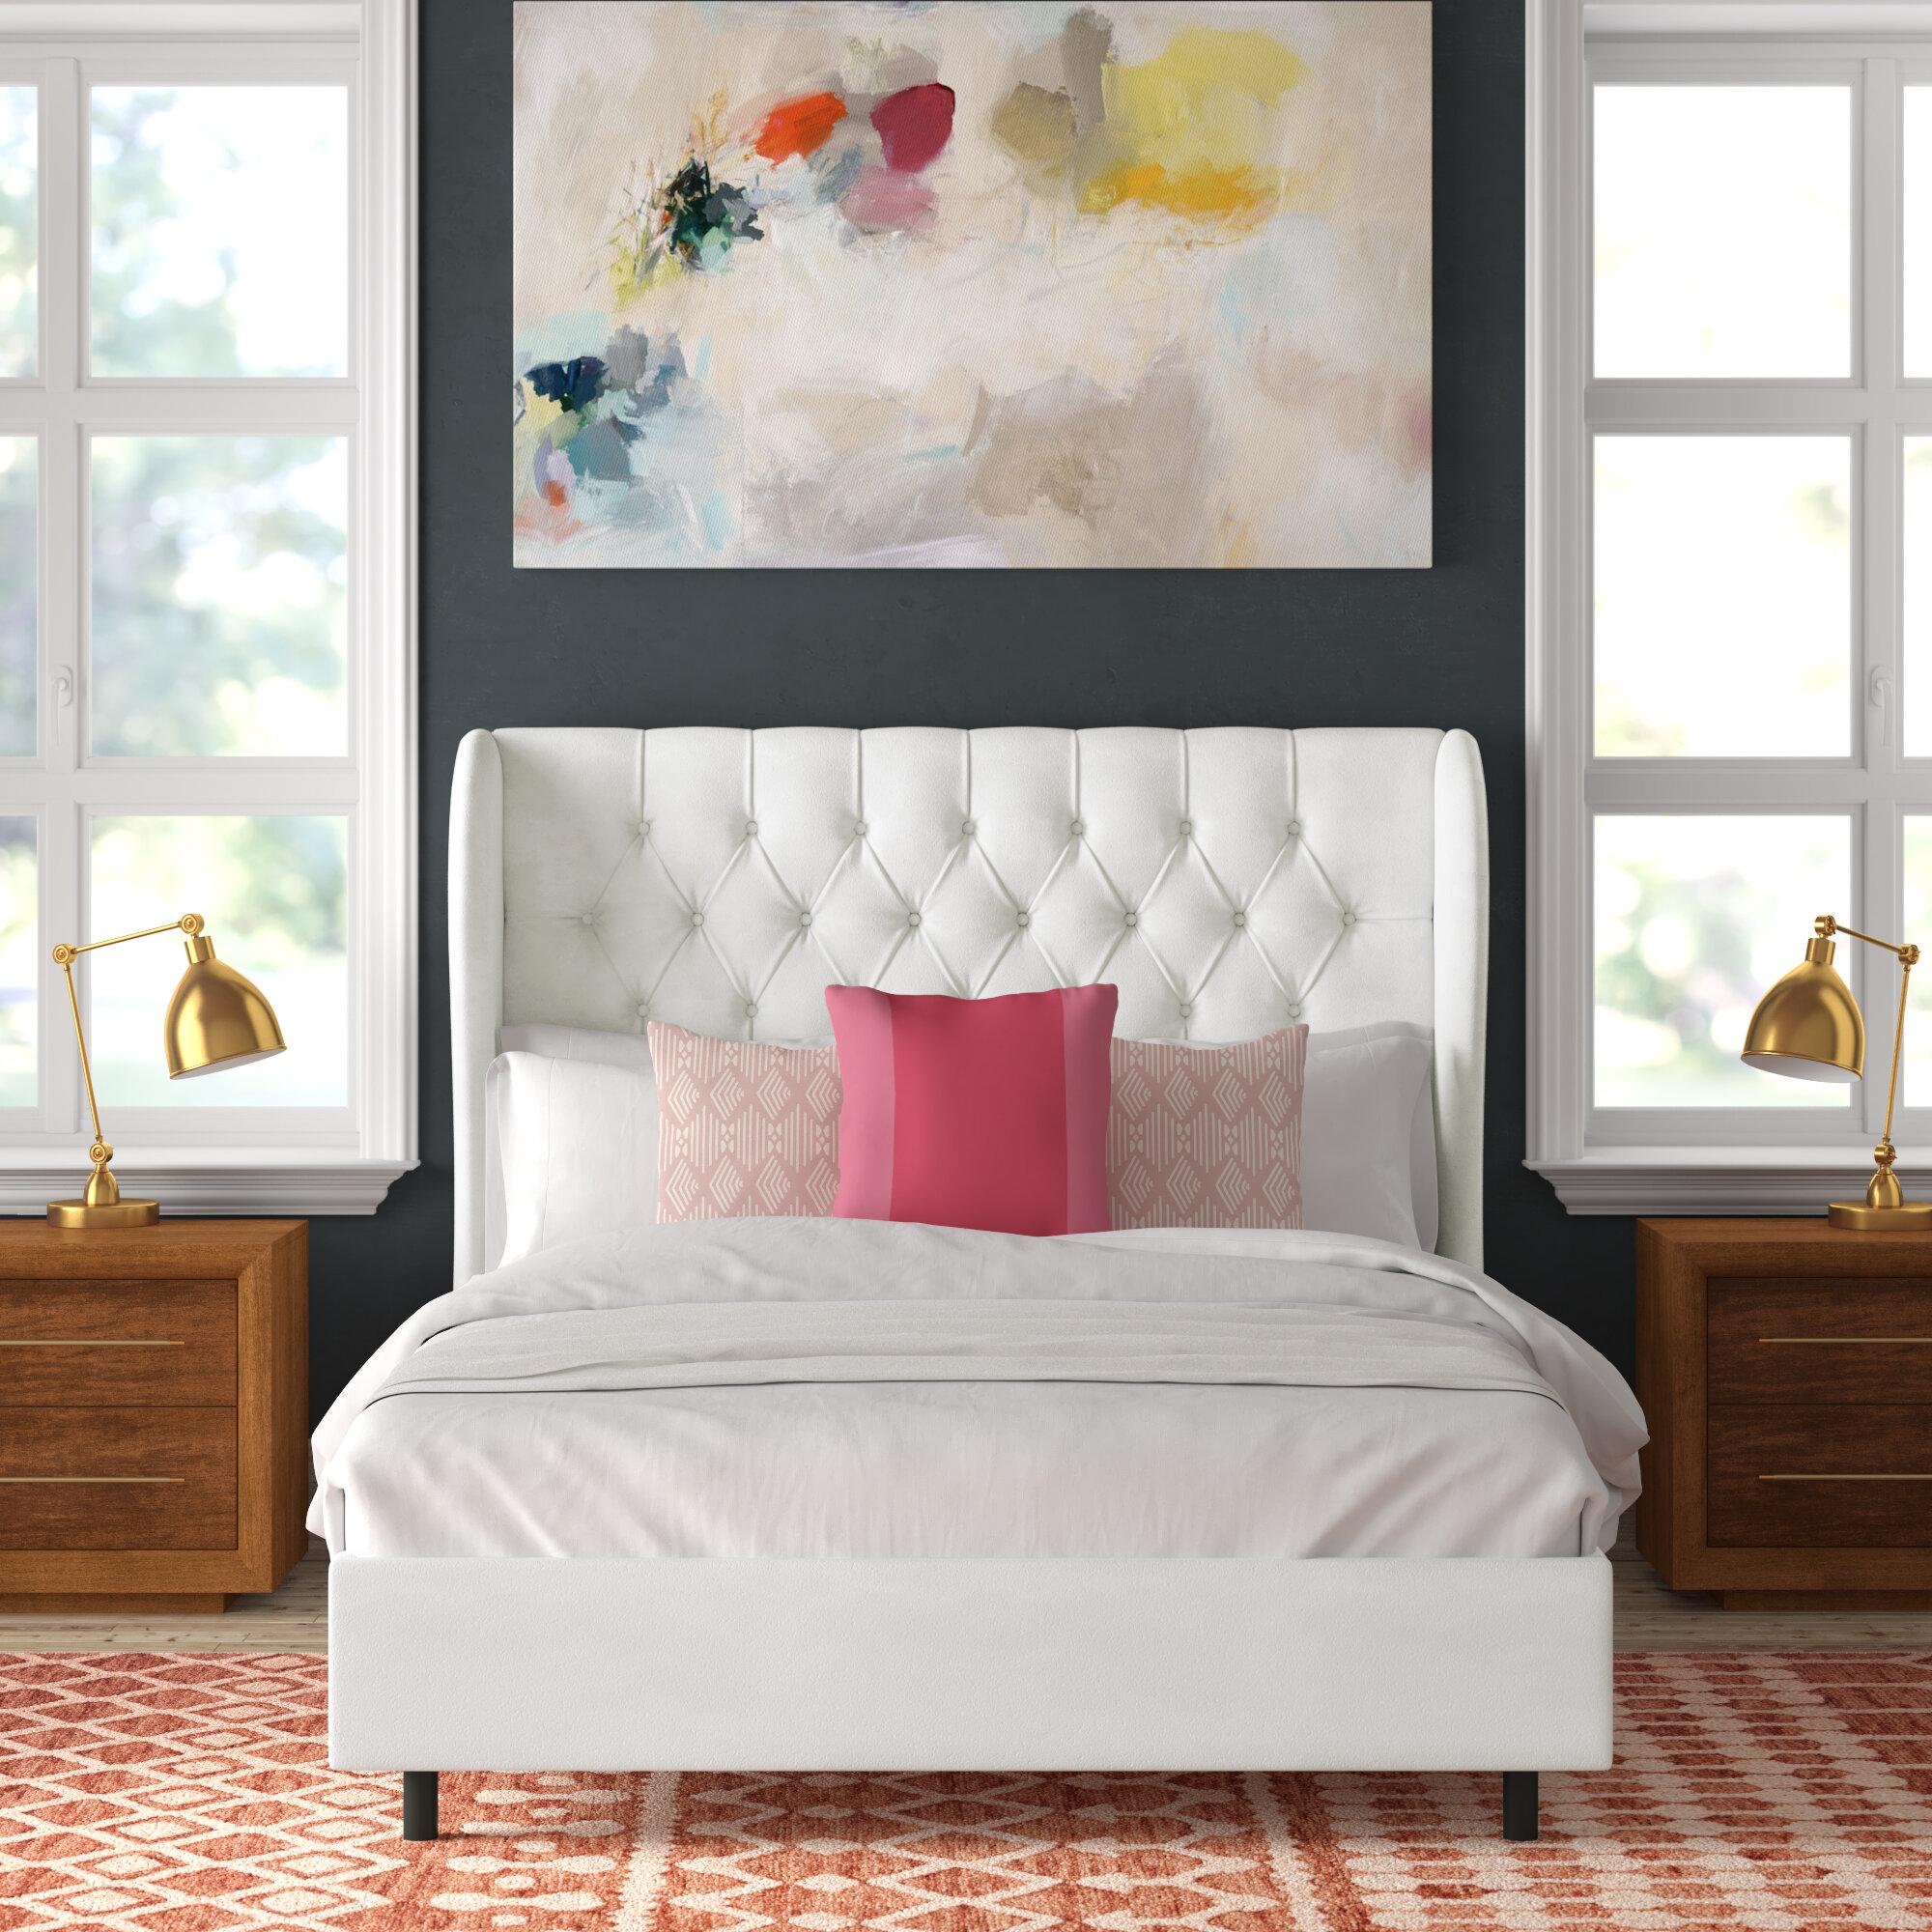 Boyles Diamond Tufted Upholstered Standard Bed Reviews Joss Main